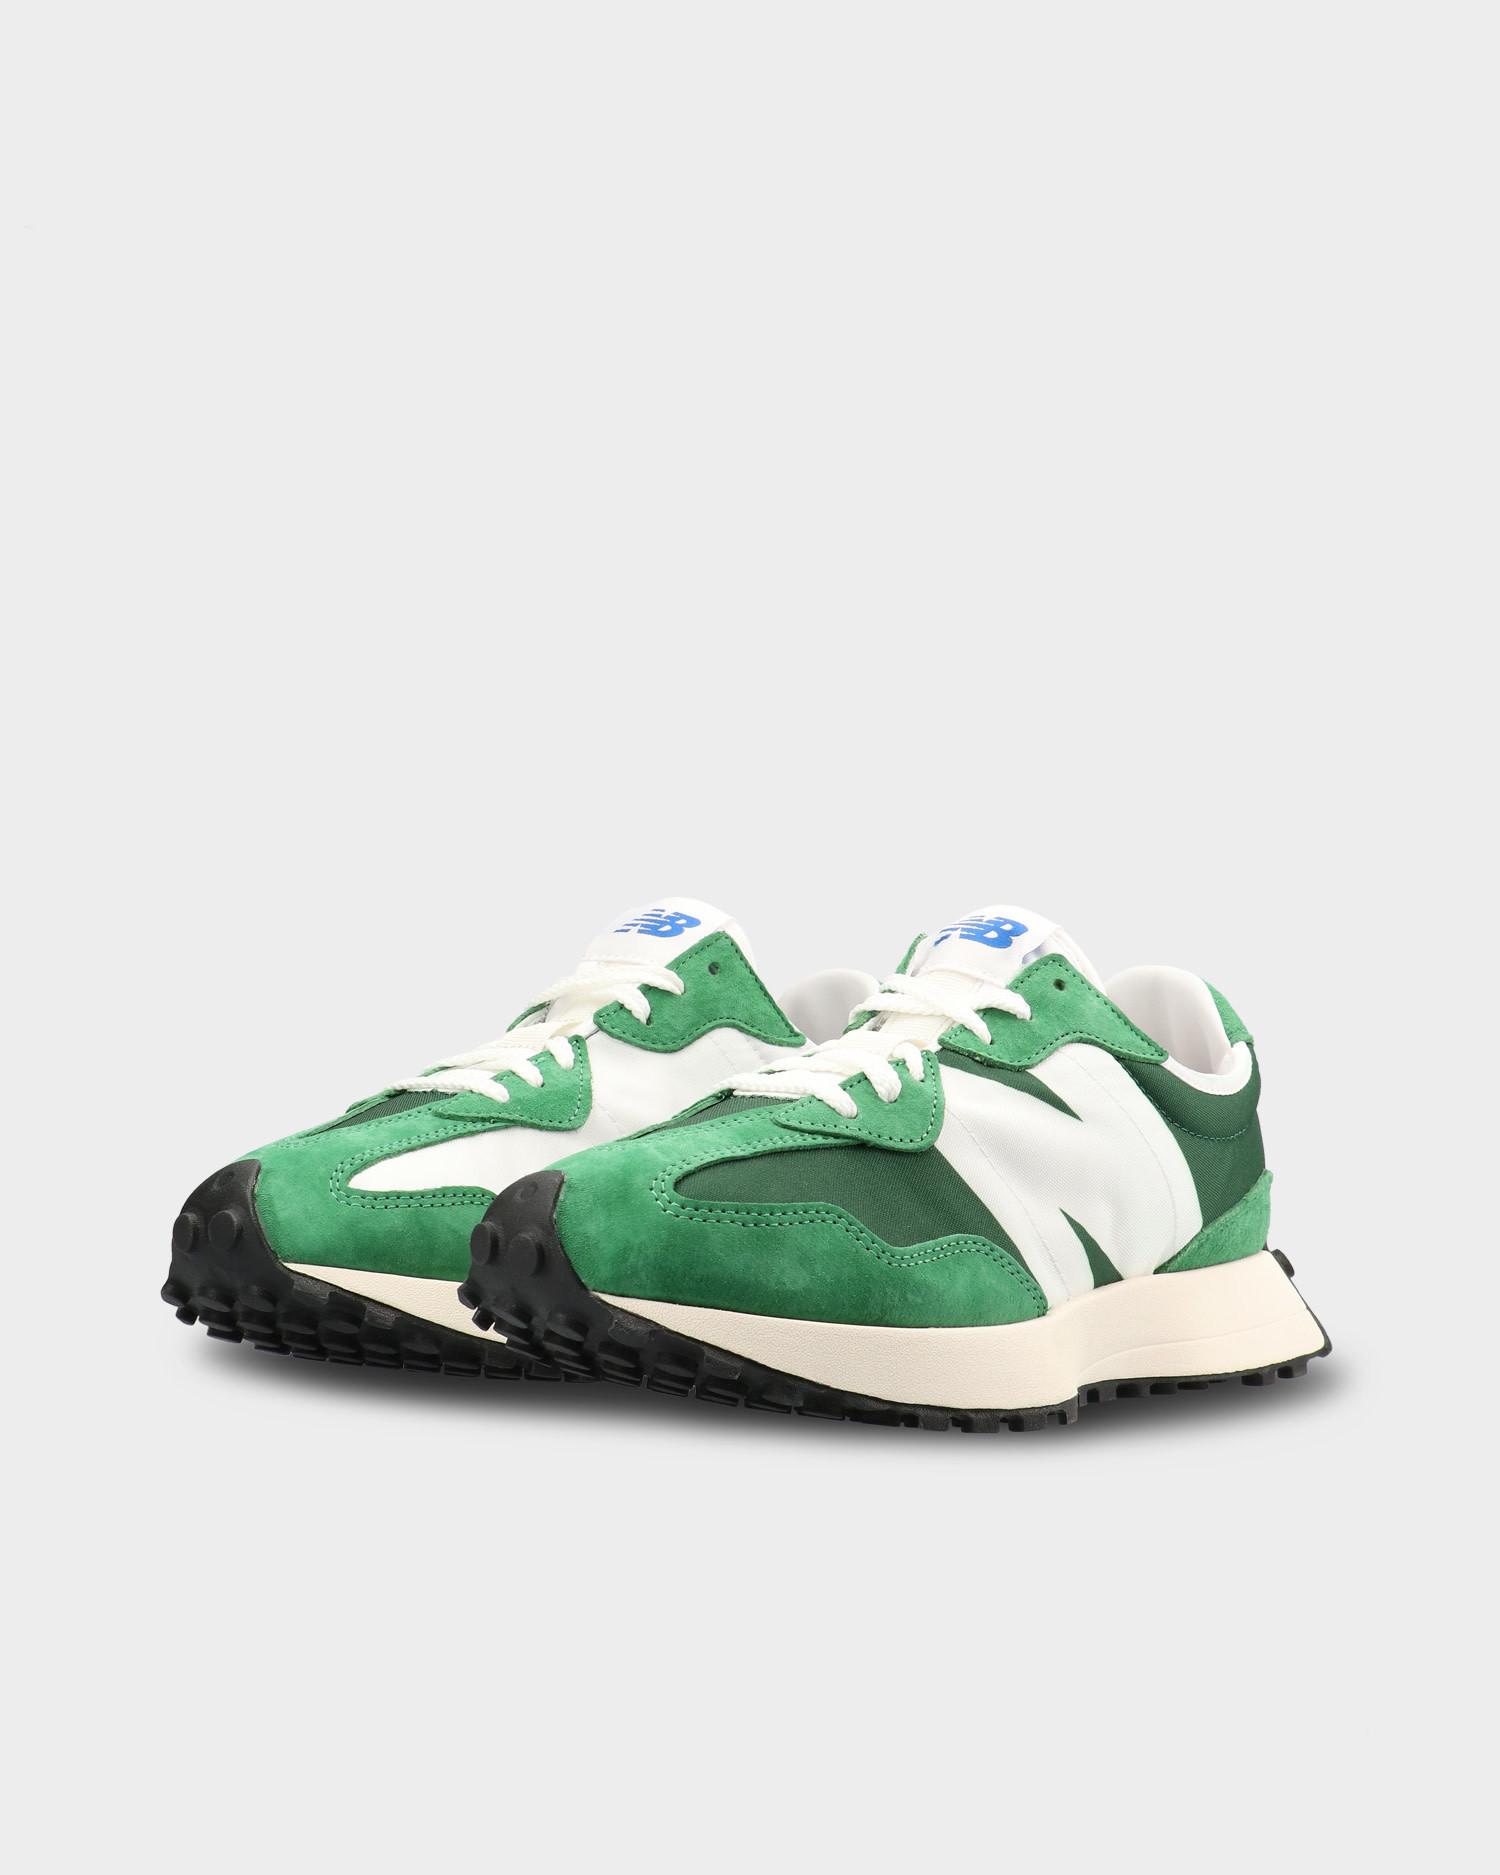 New Balance MS327LG1 Green/White